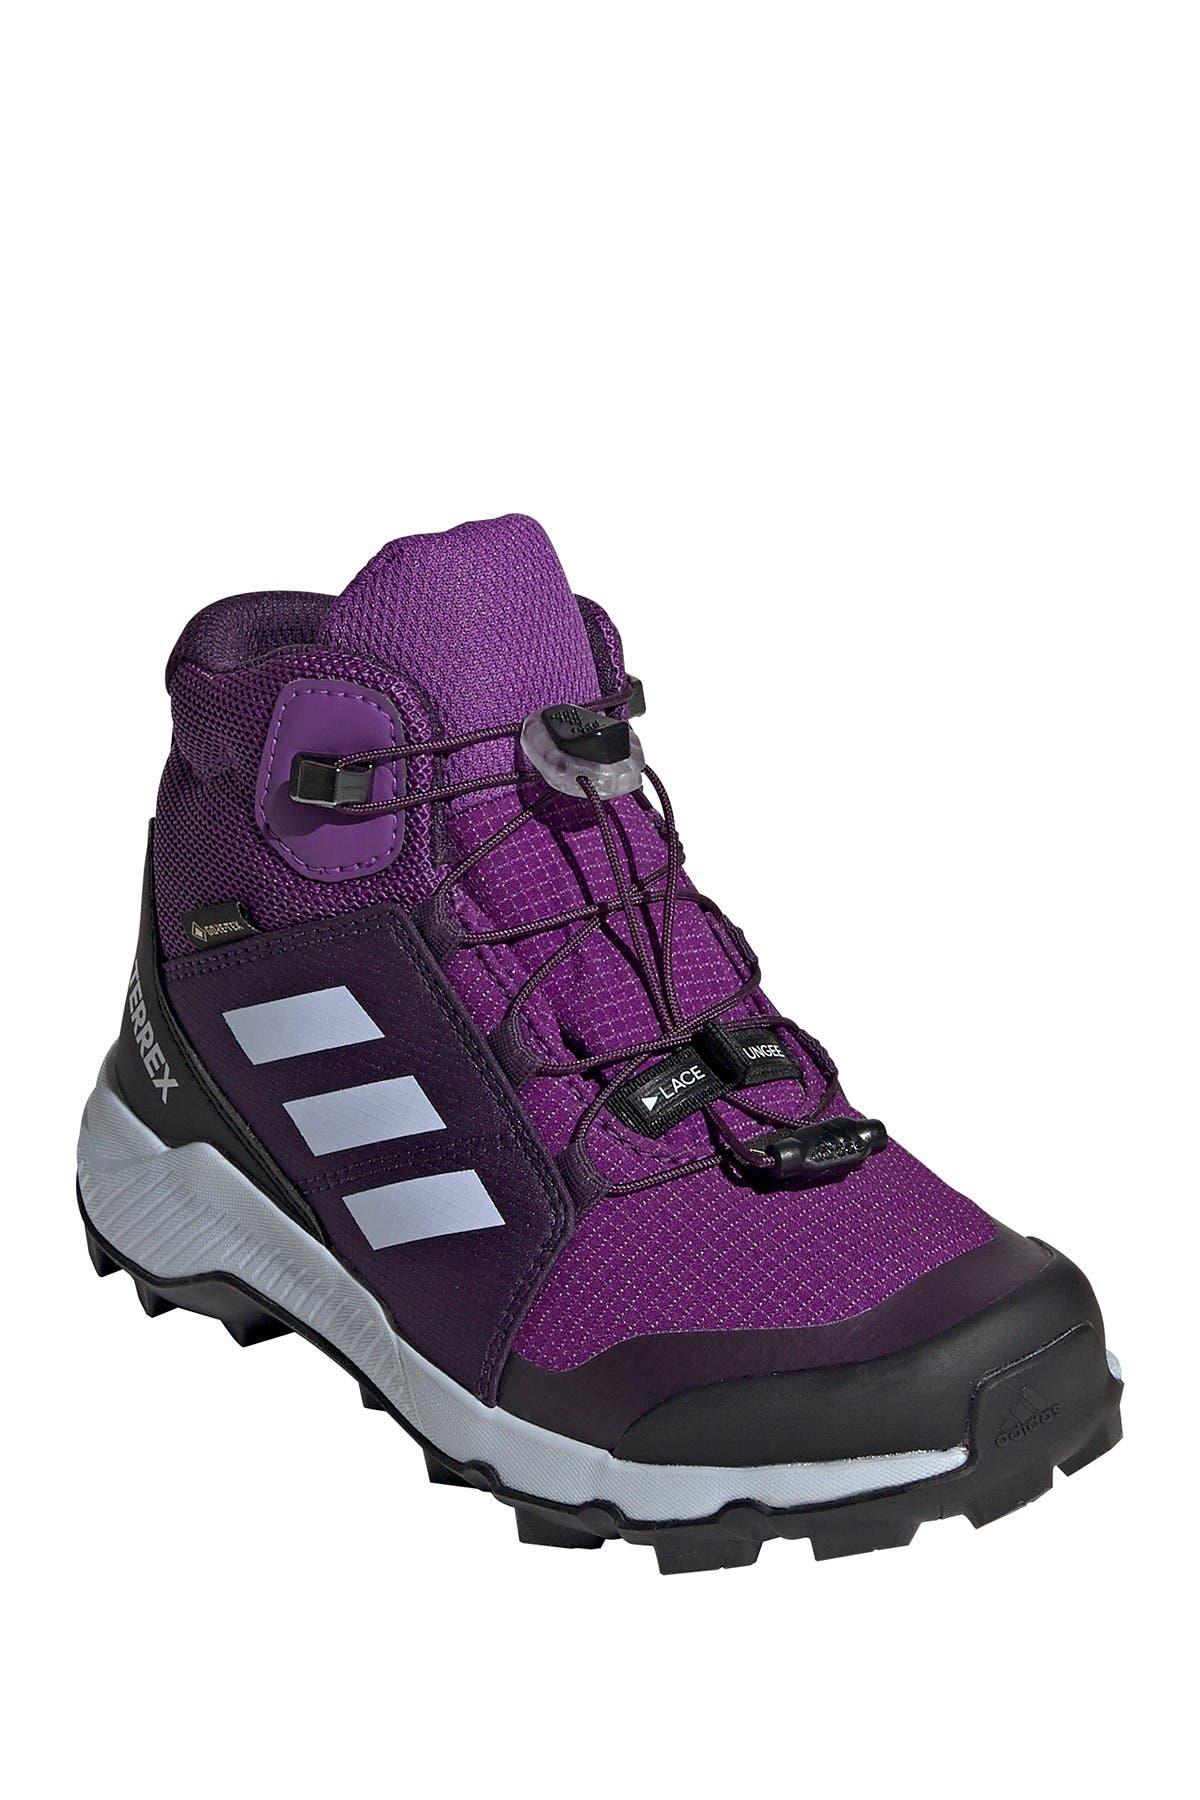 adidas waterproof hiking shoes